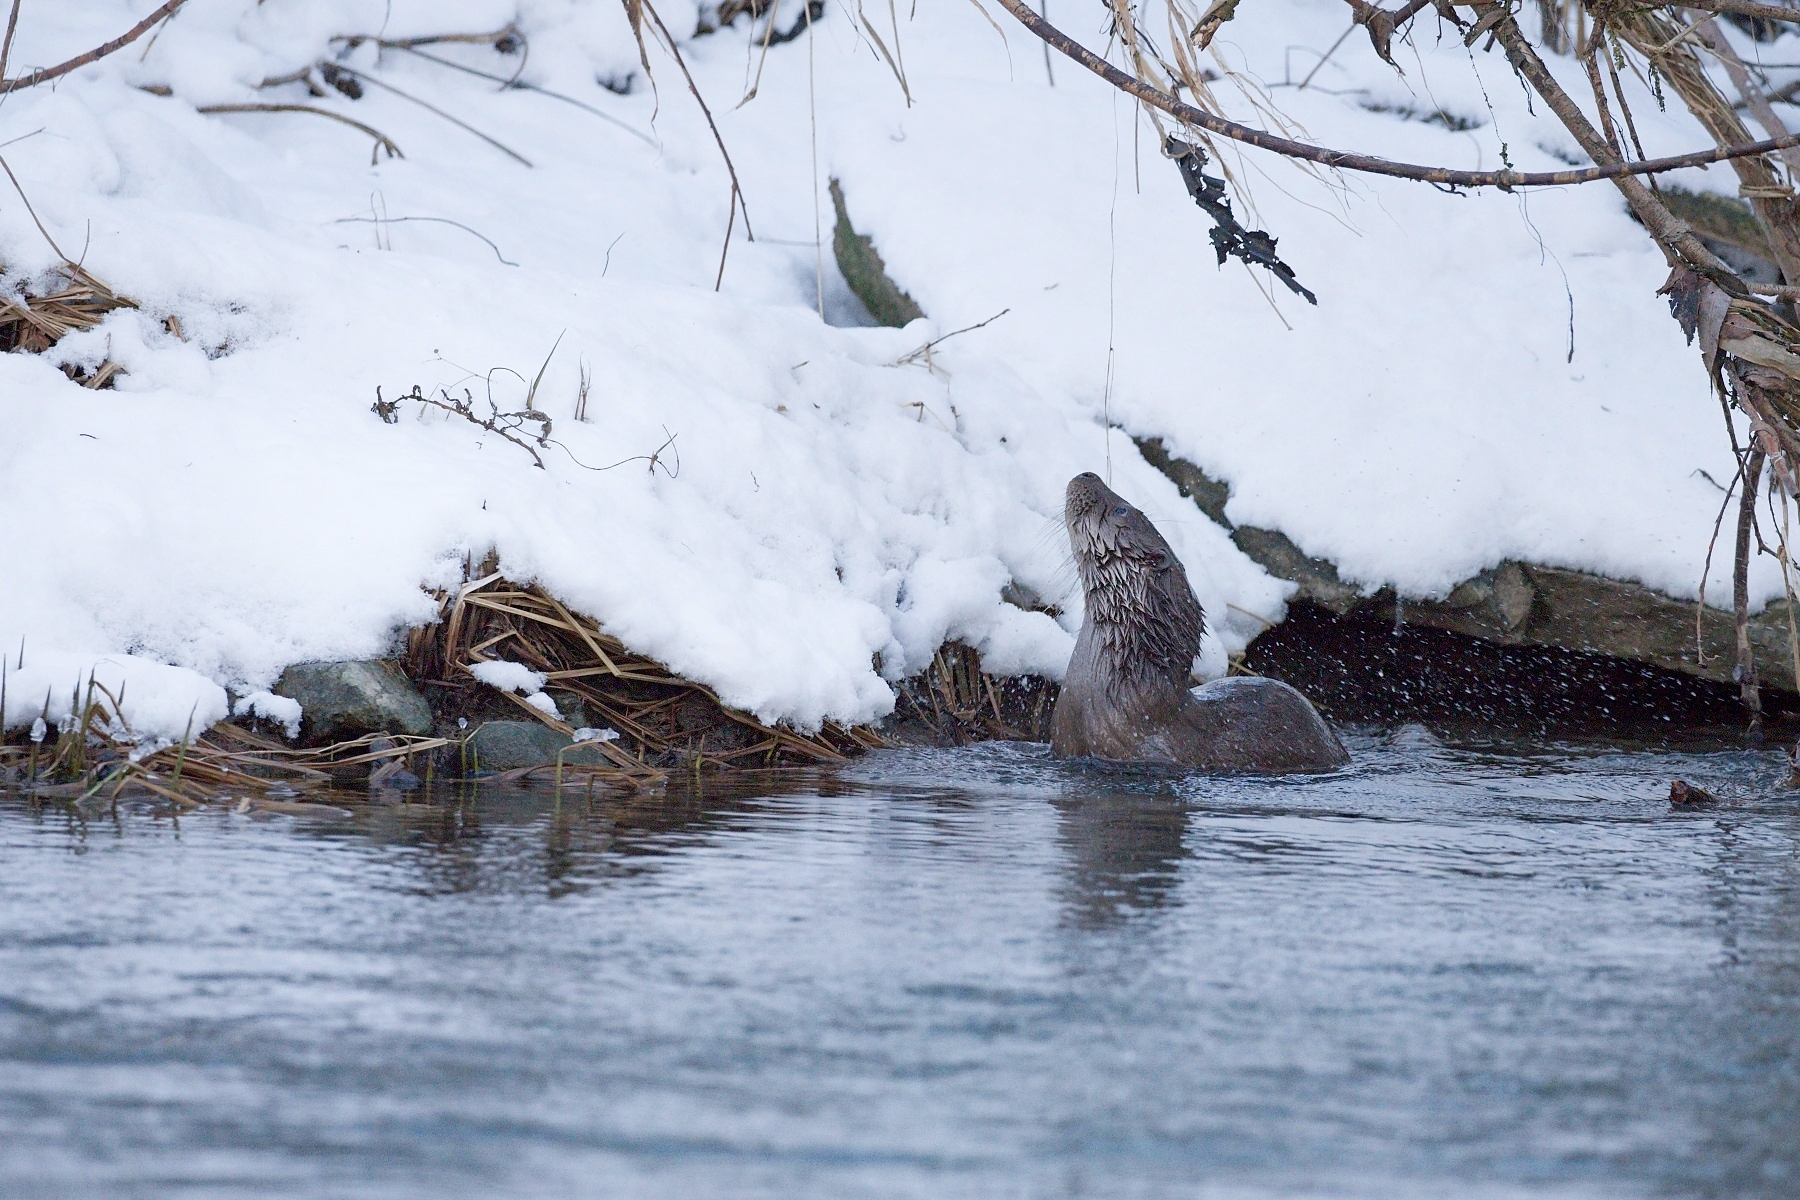 vydra riečna (Lutra lutra) Eurasian otter, Turčianska kotlina, Slovensko Canon EOS 6D mark II, Canon 100-400 mm f4.5-5.6 L IS II USM, 286 mm, f5, 1/640, ISO 1600, 5. január 2020